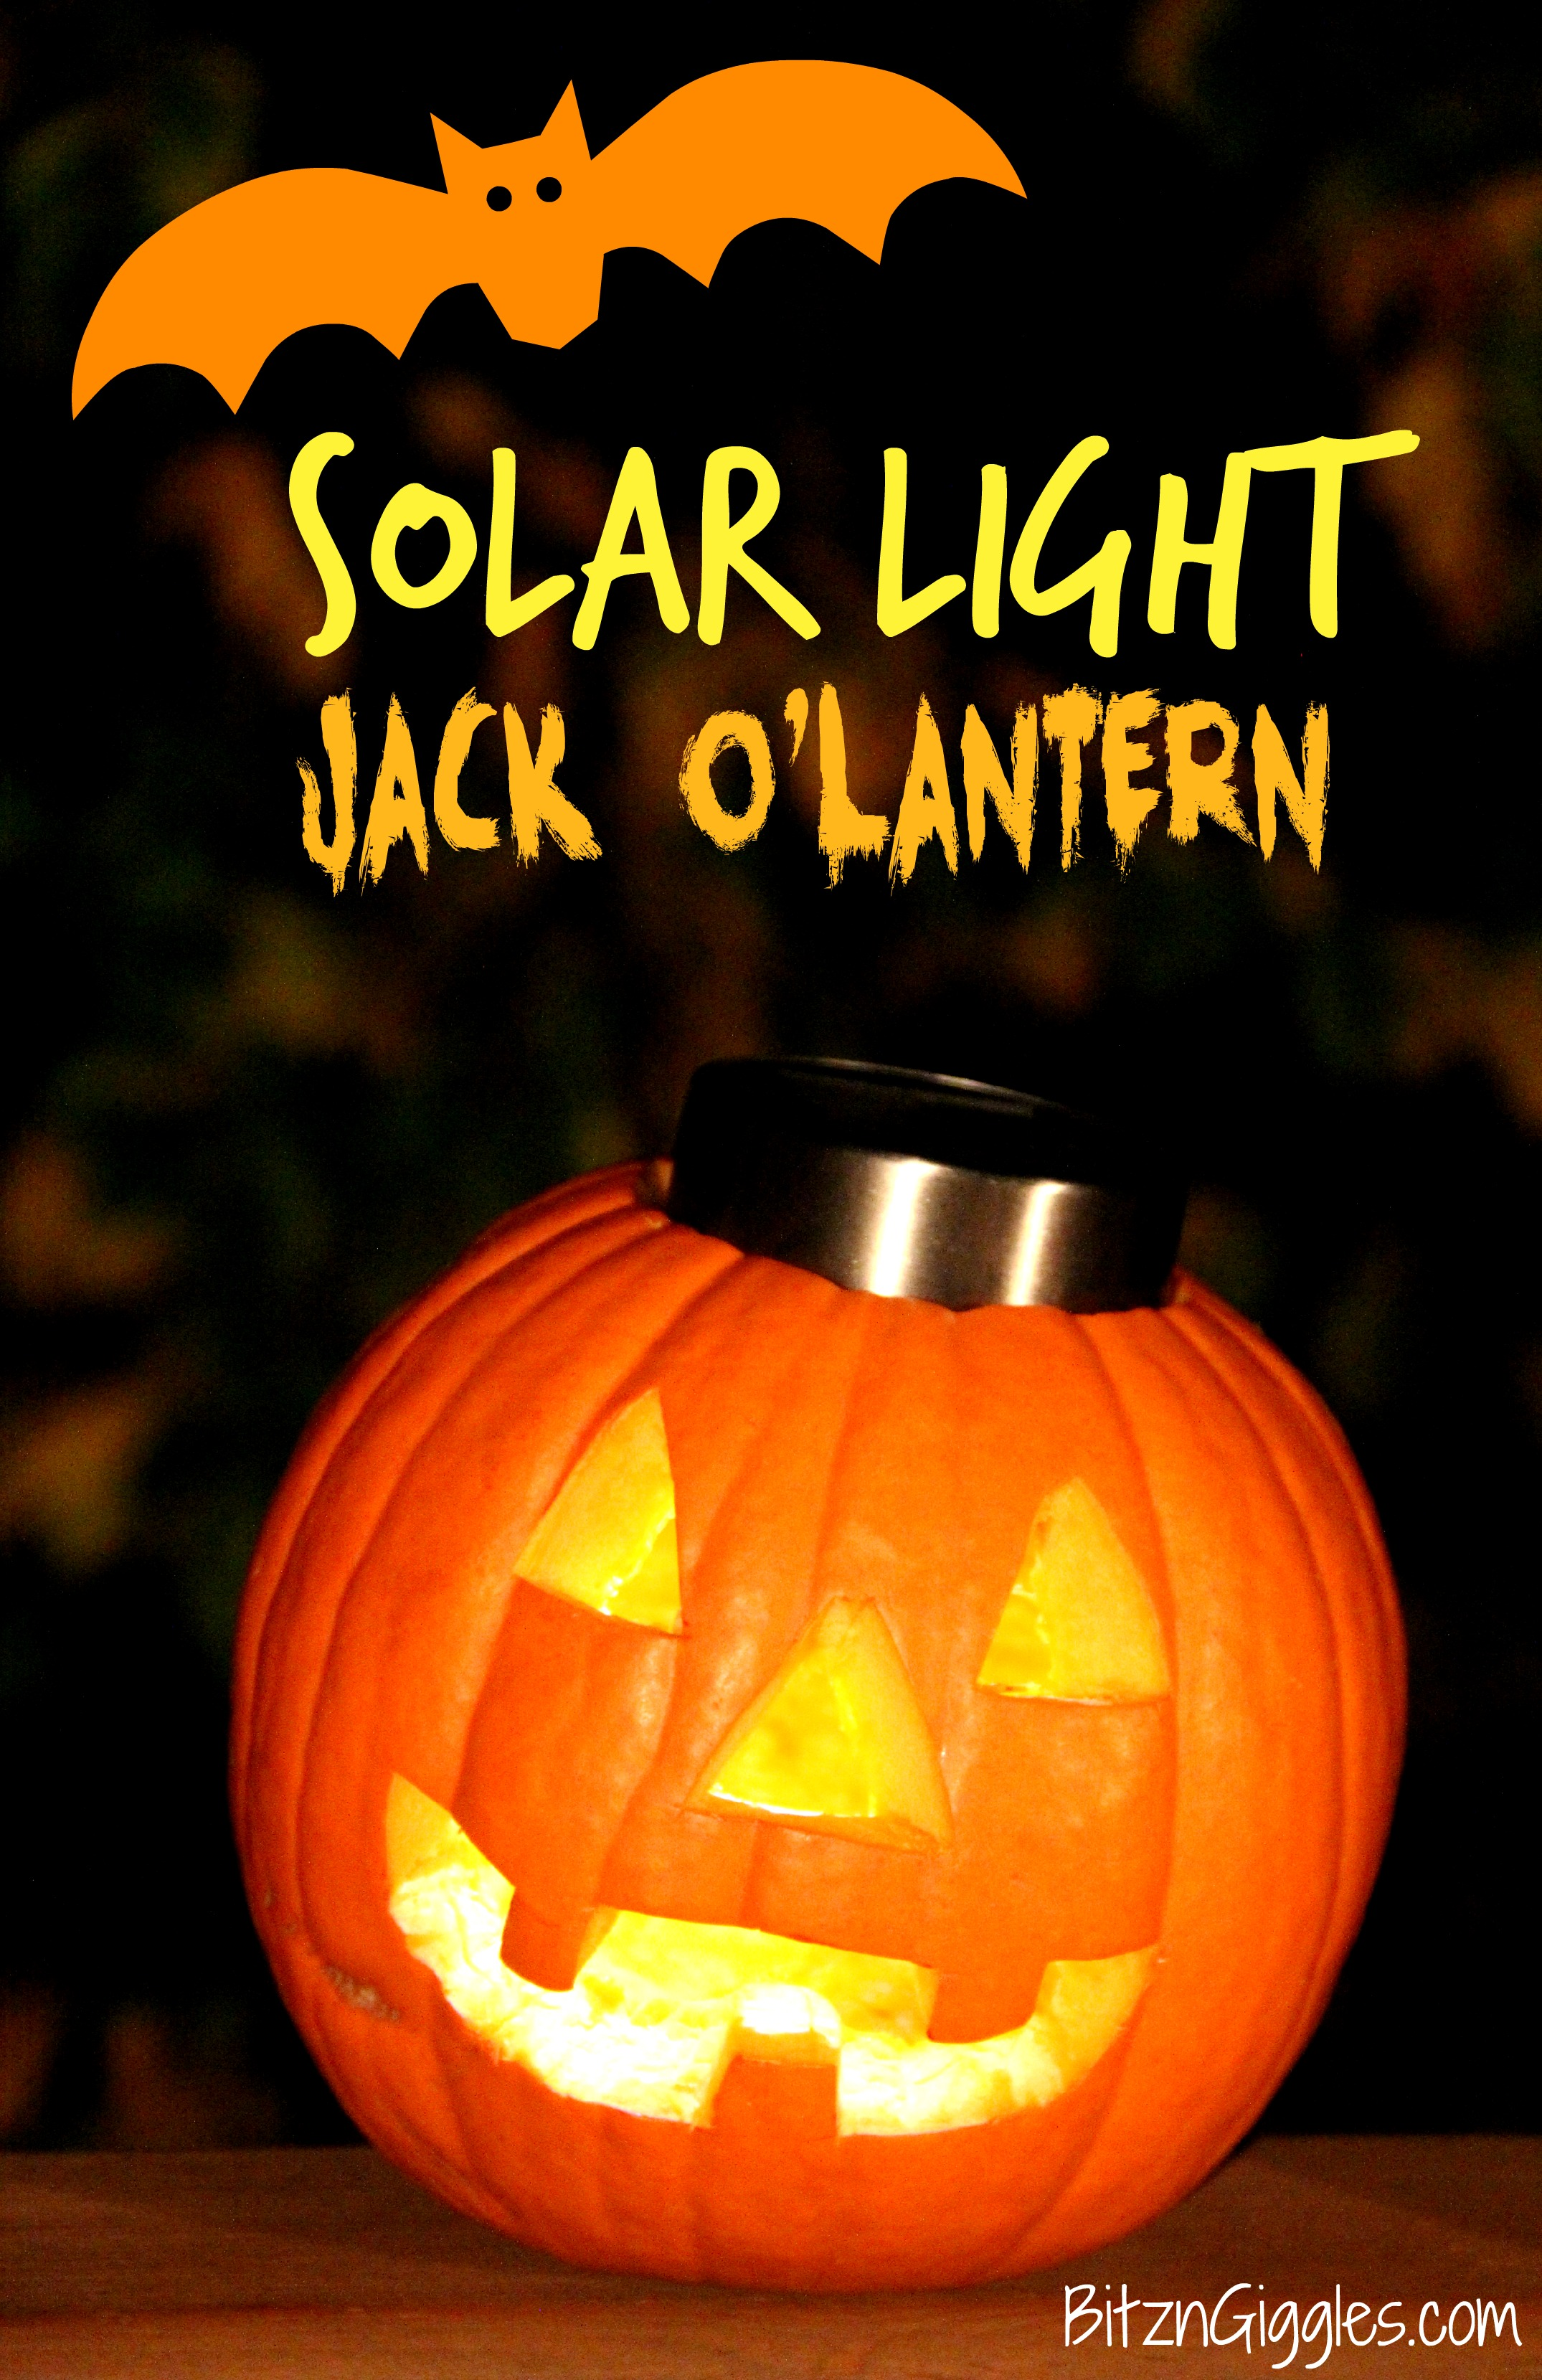 Solar Light Jack-o-Lantern